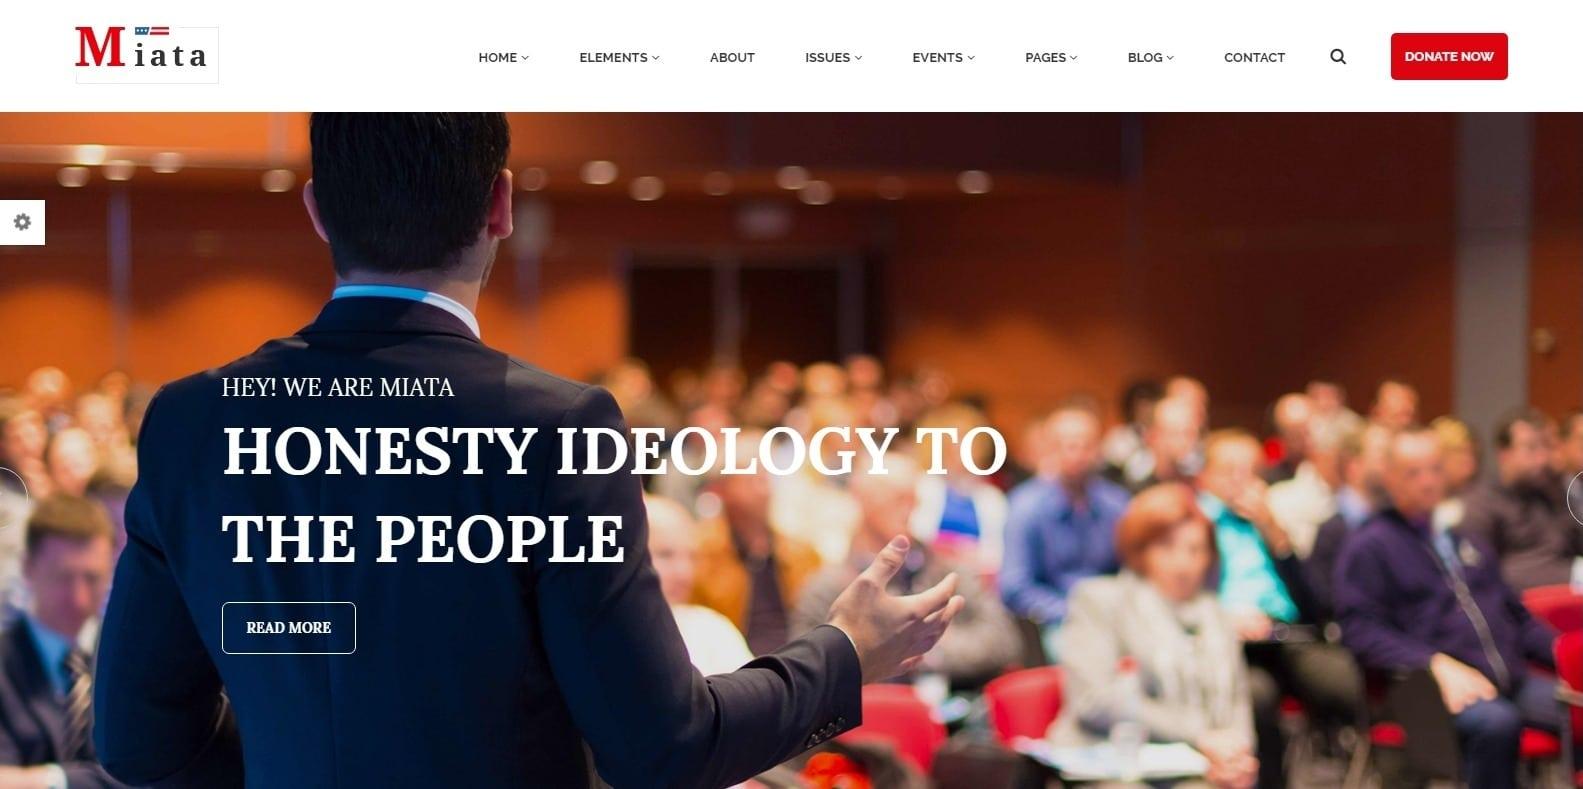 miata-political-website-template